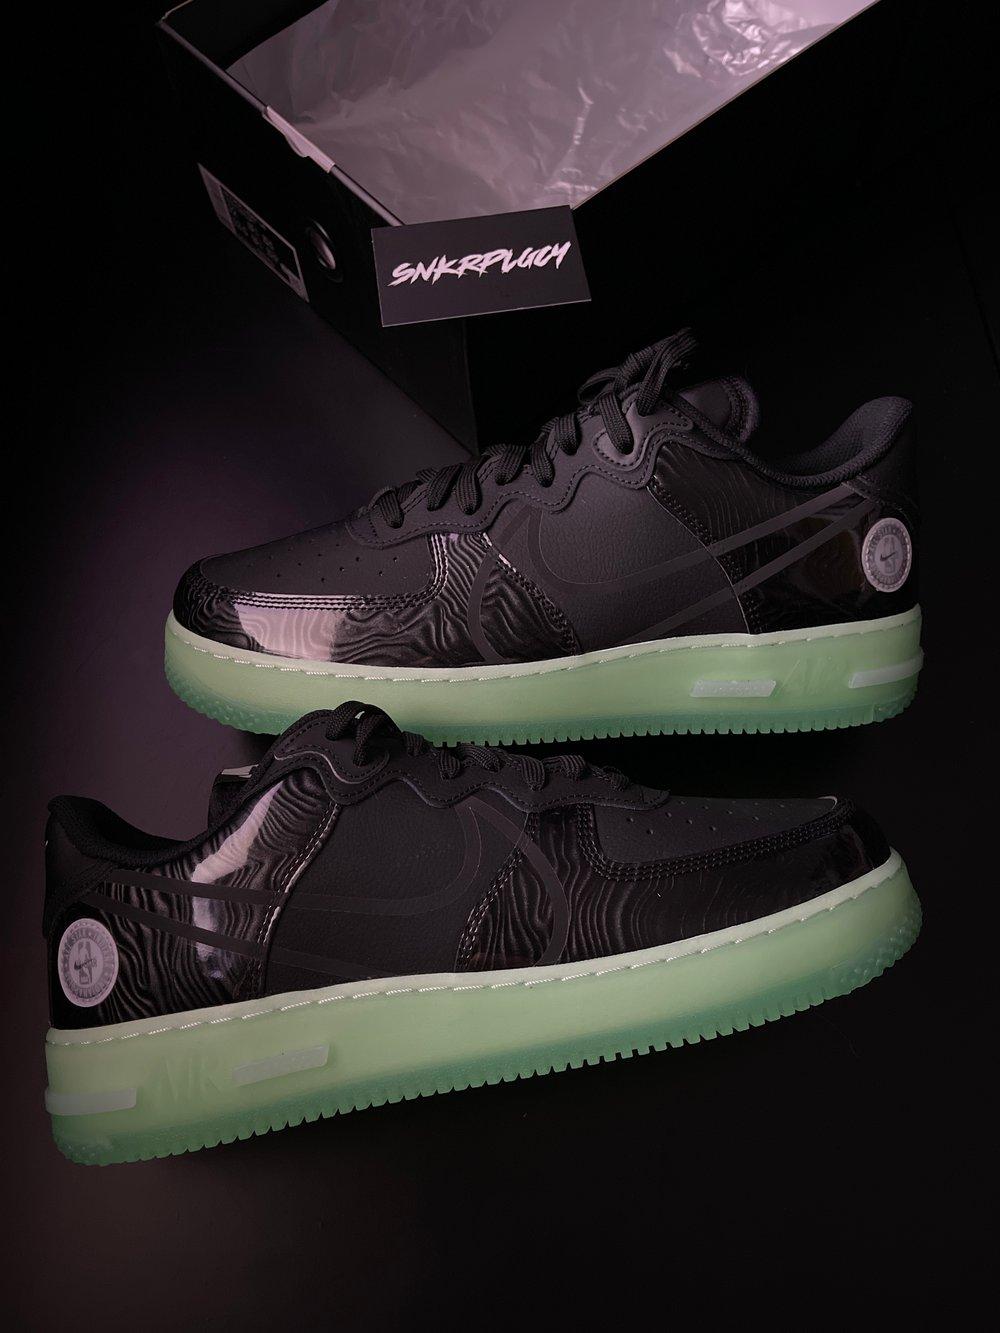 Nike Air Force 1 All Star